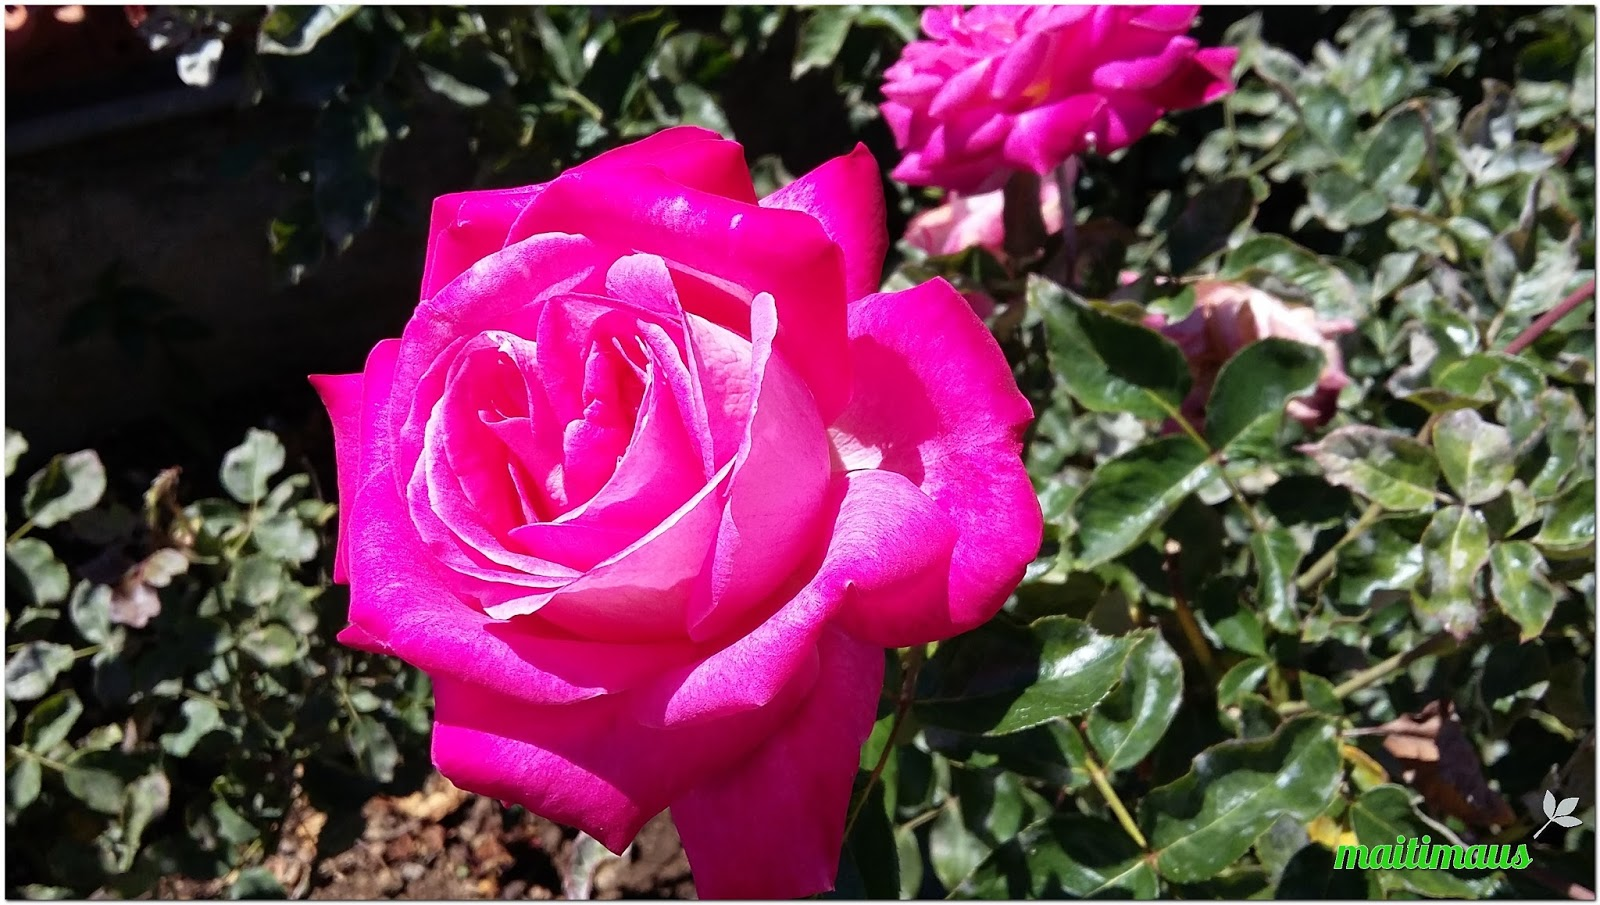 Maitimaus Platano Para Unas Bonitas Flores - Flores-bonitas-para-jardin